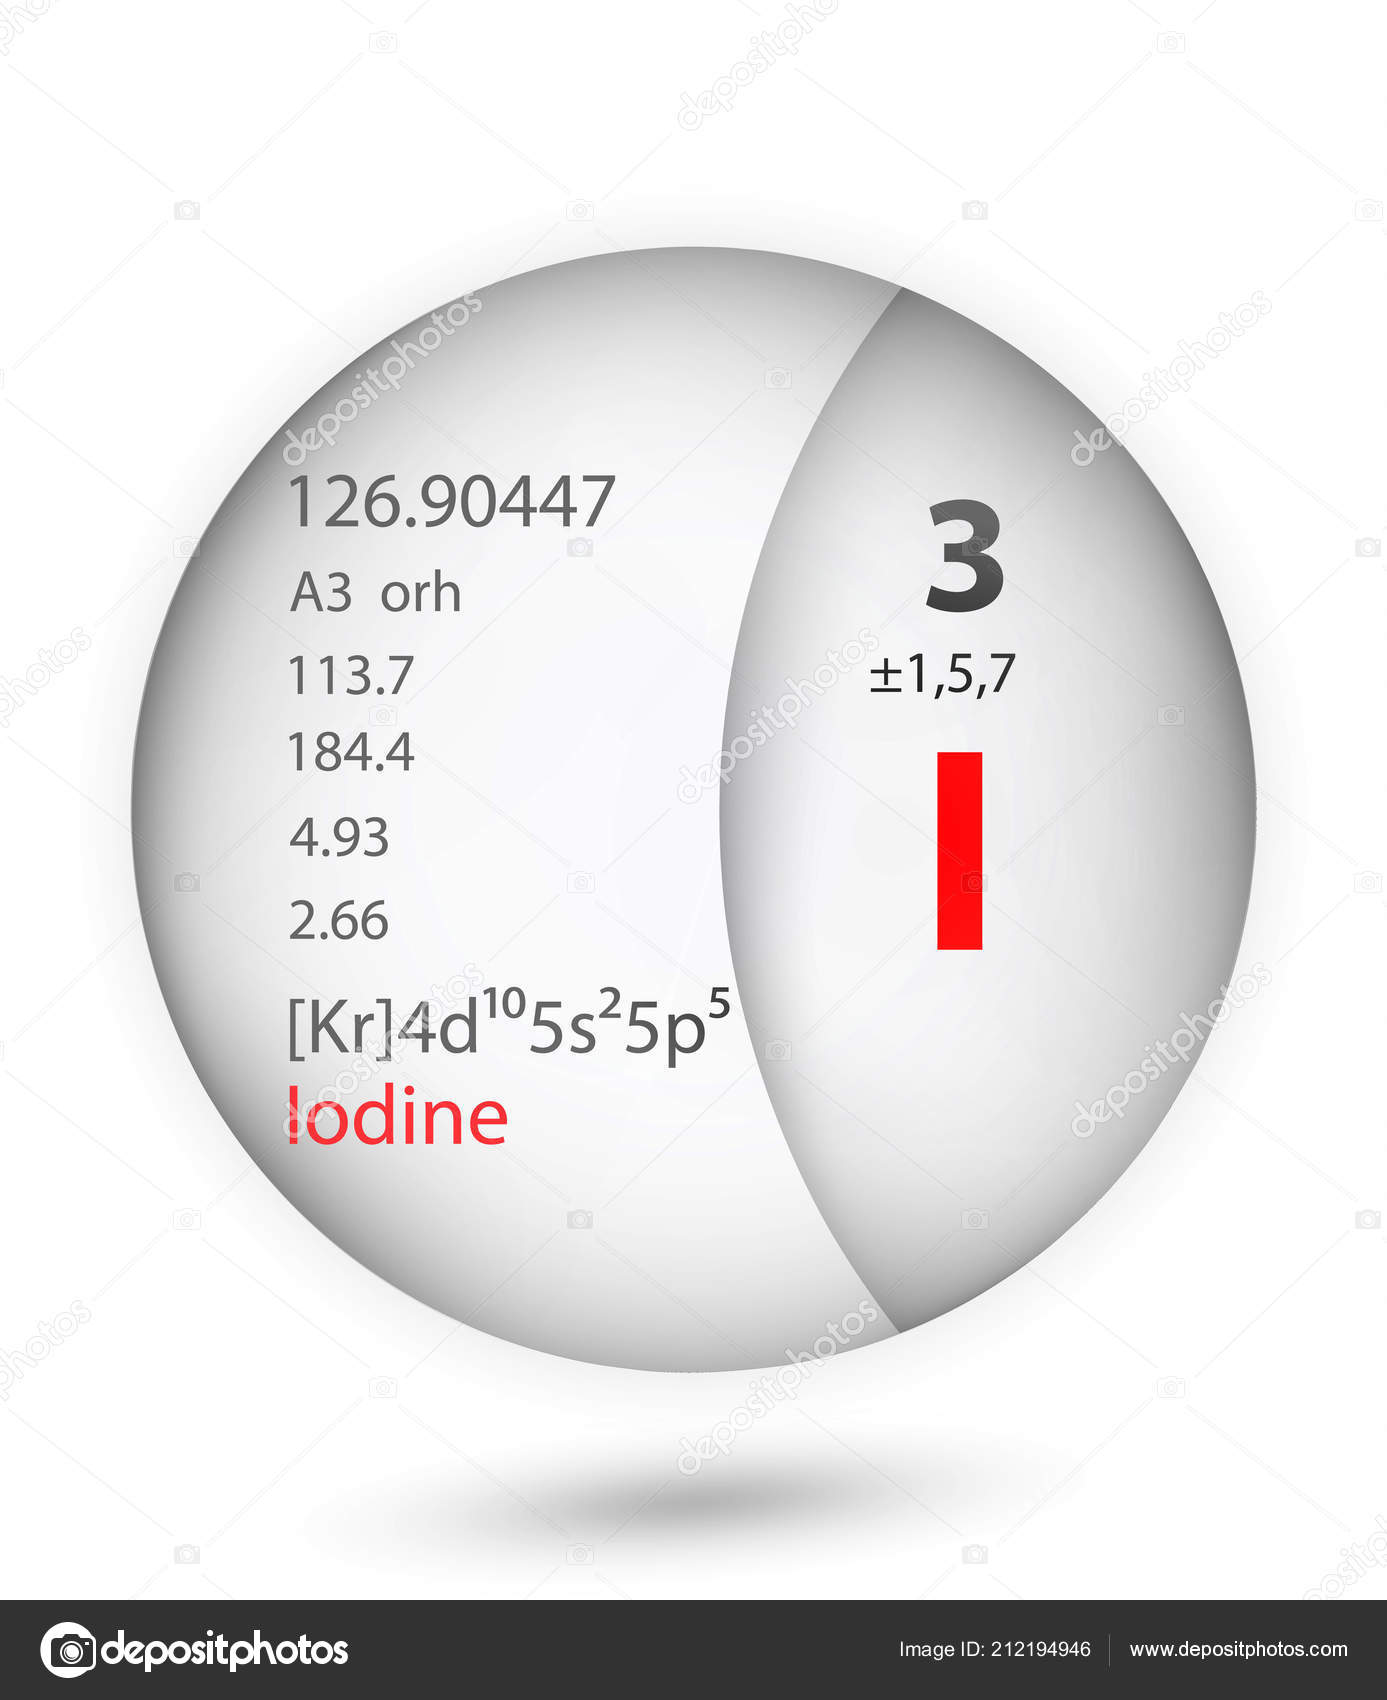 hight resolution of iodine icon badge style periodic table element iodine icon one stock vector